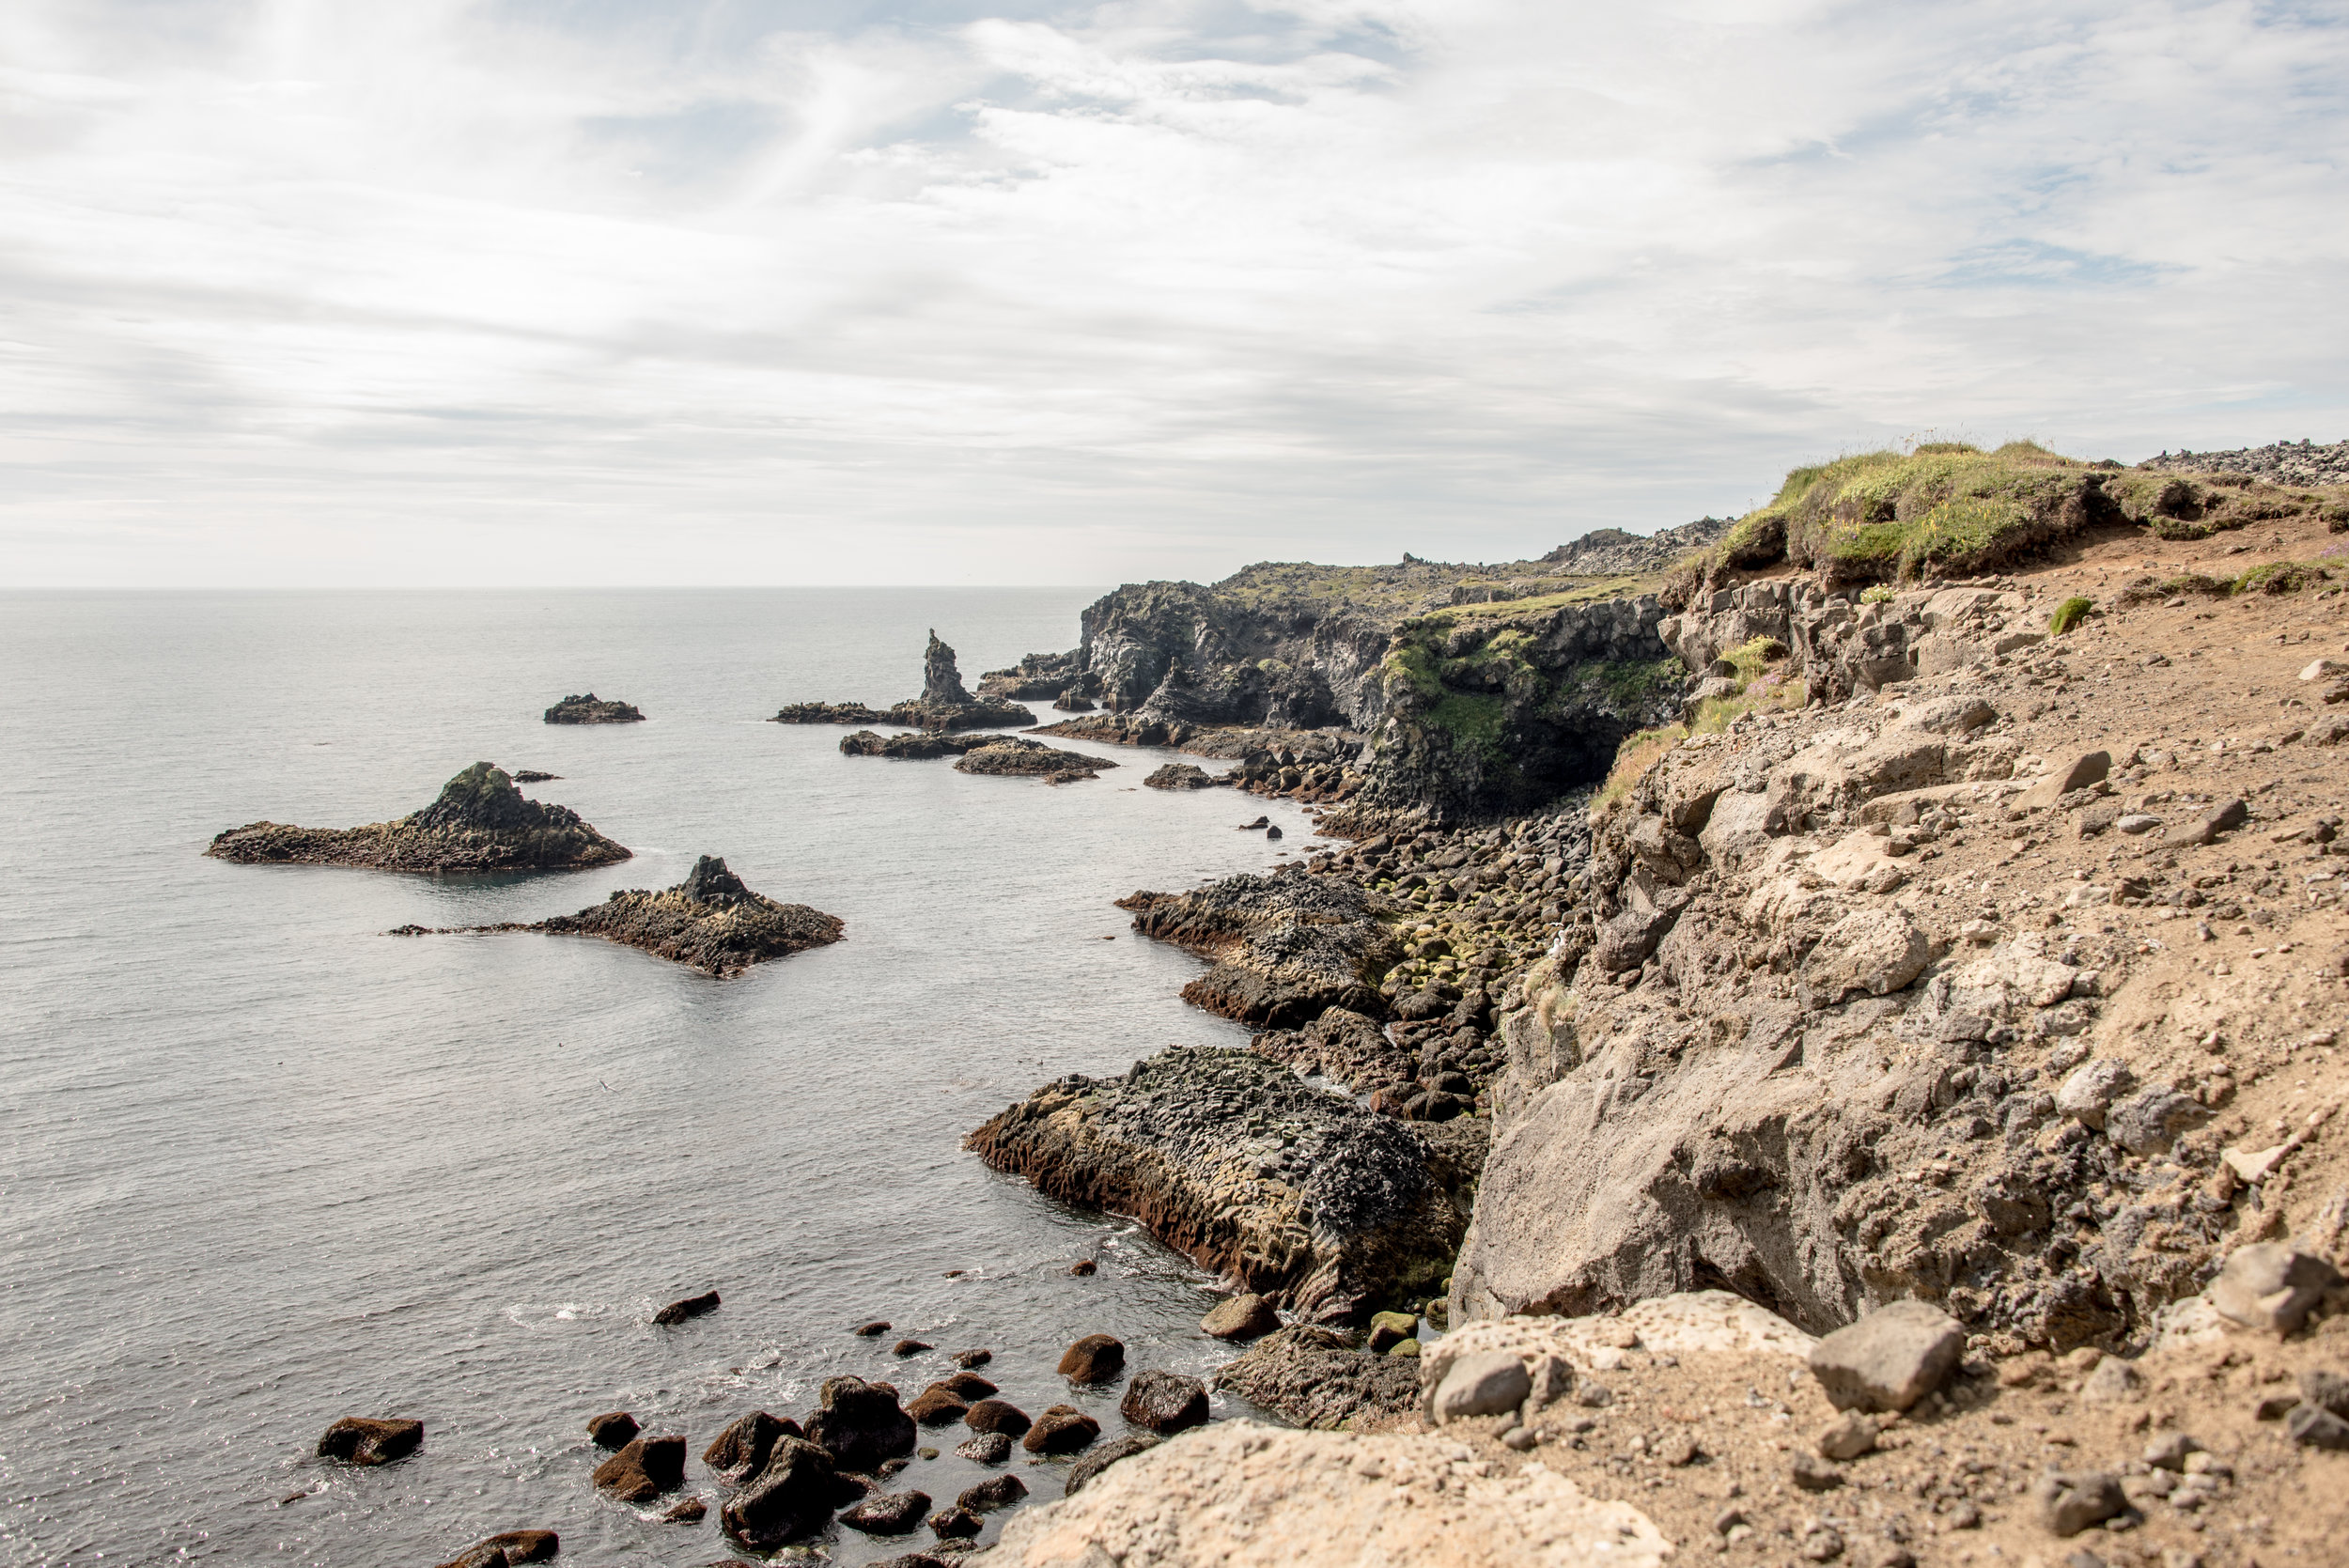 The coast between Arnarstapi and Hellnar, on the Snaefellsnes peninsula.